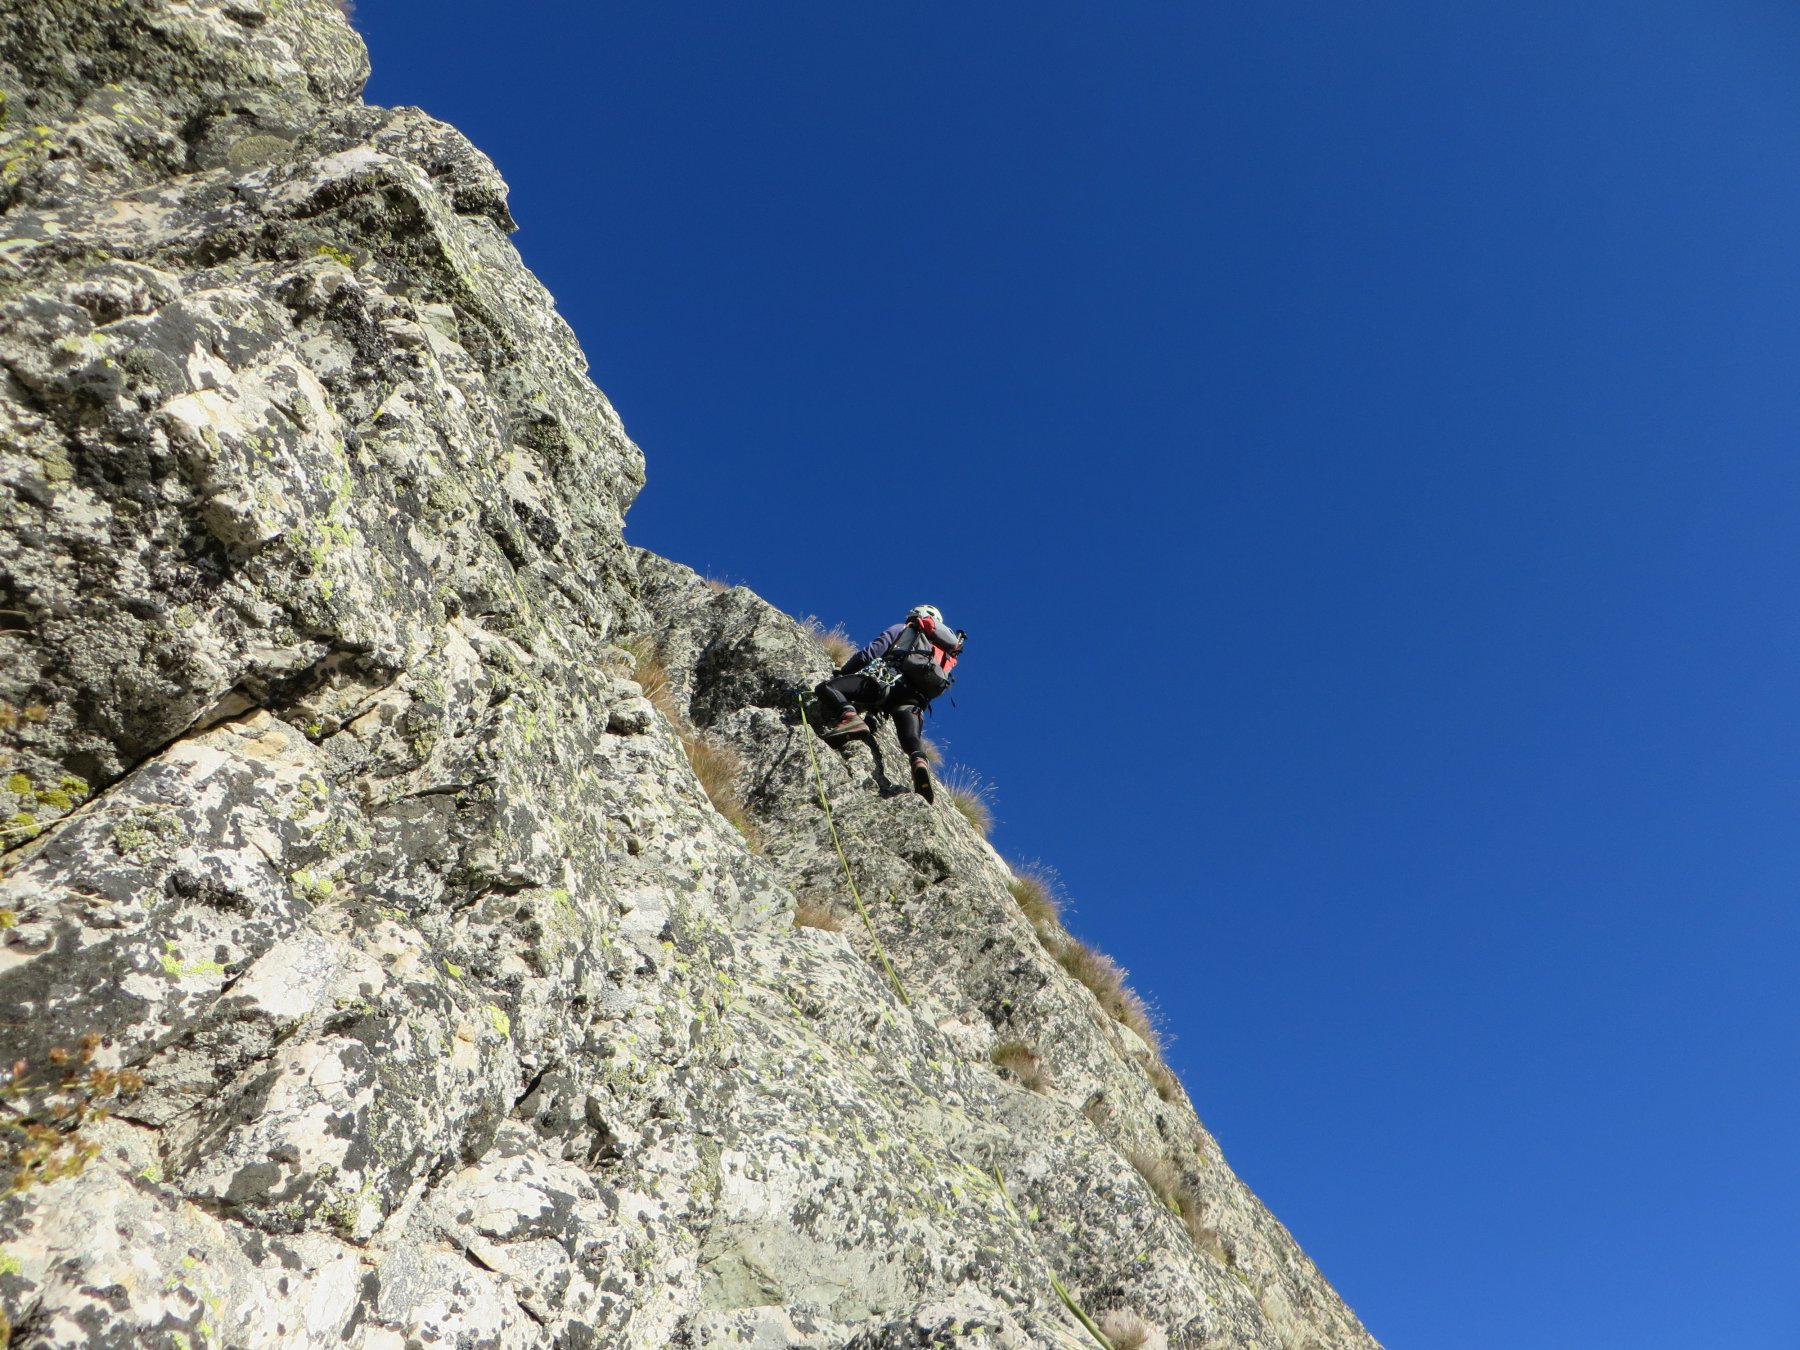 Ultimi metri per guadagnare Punta Emma